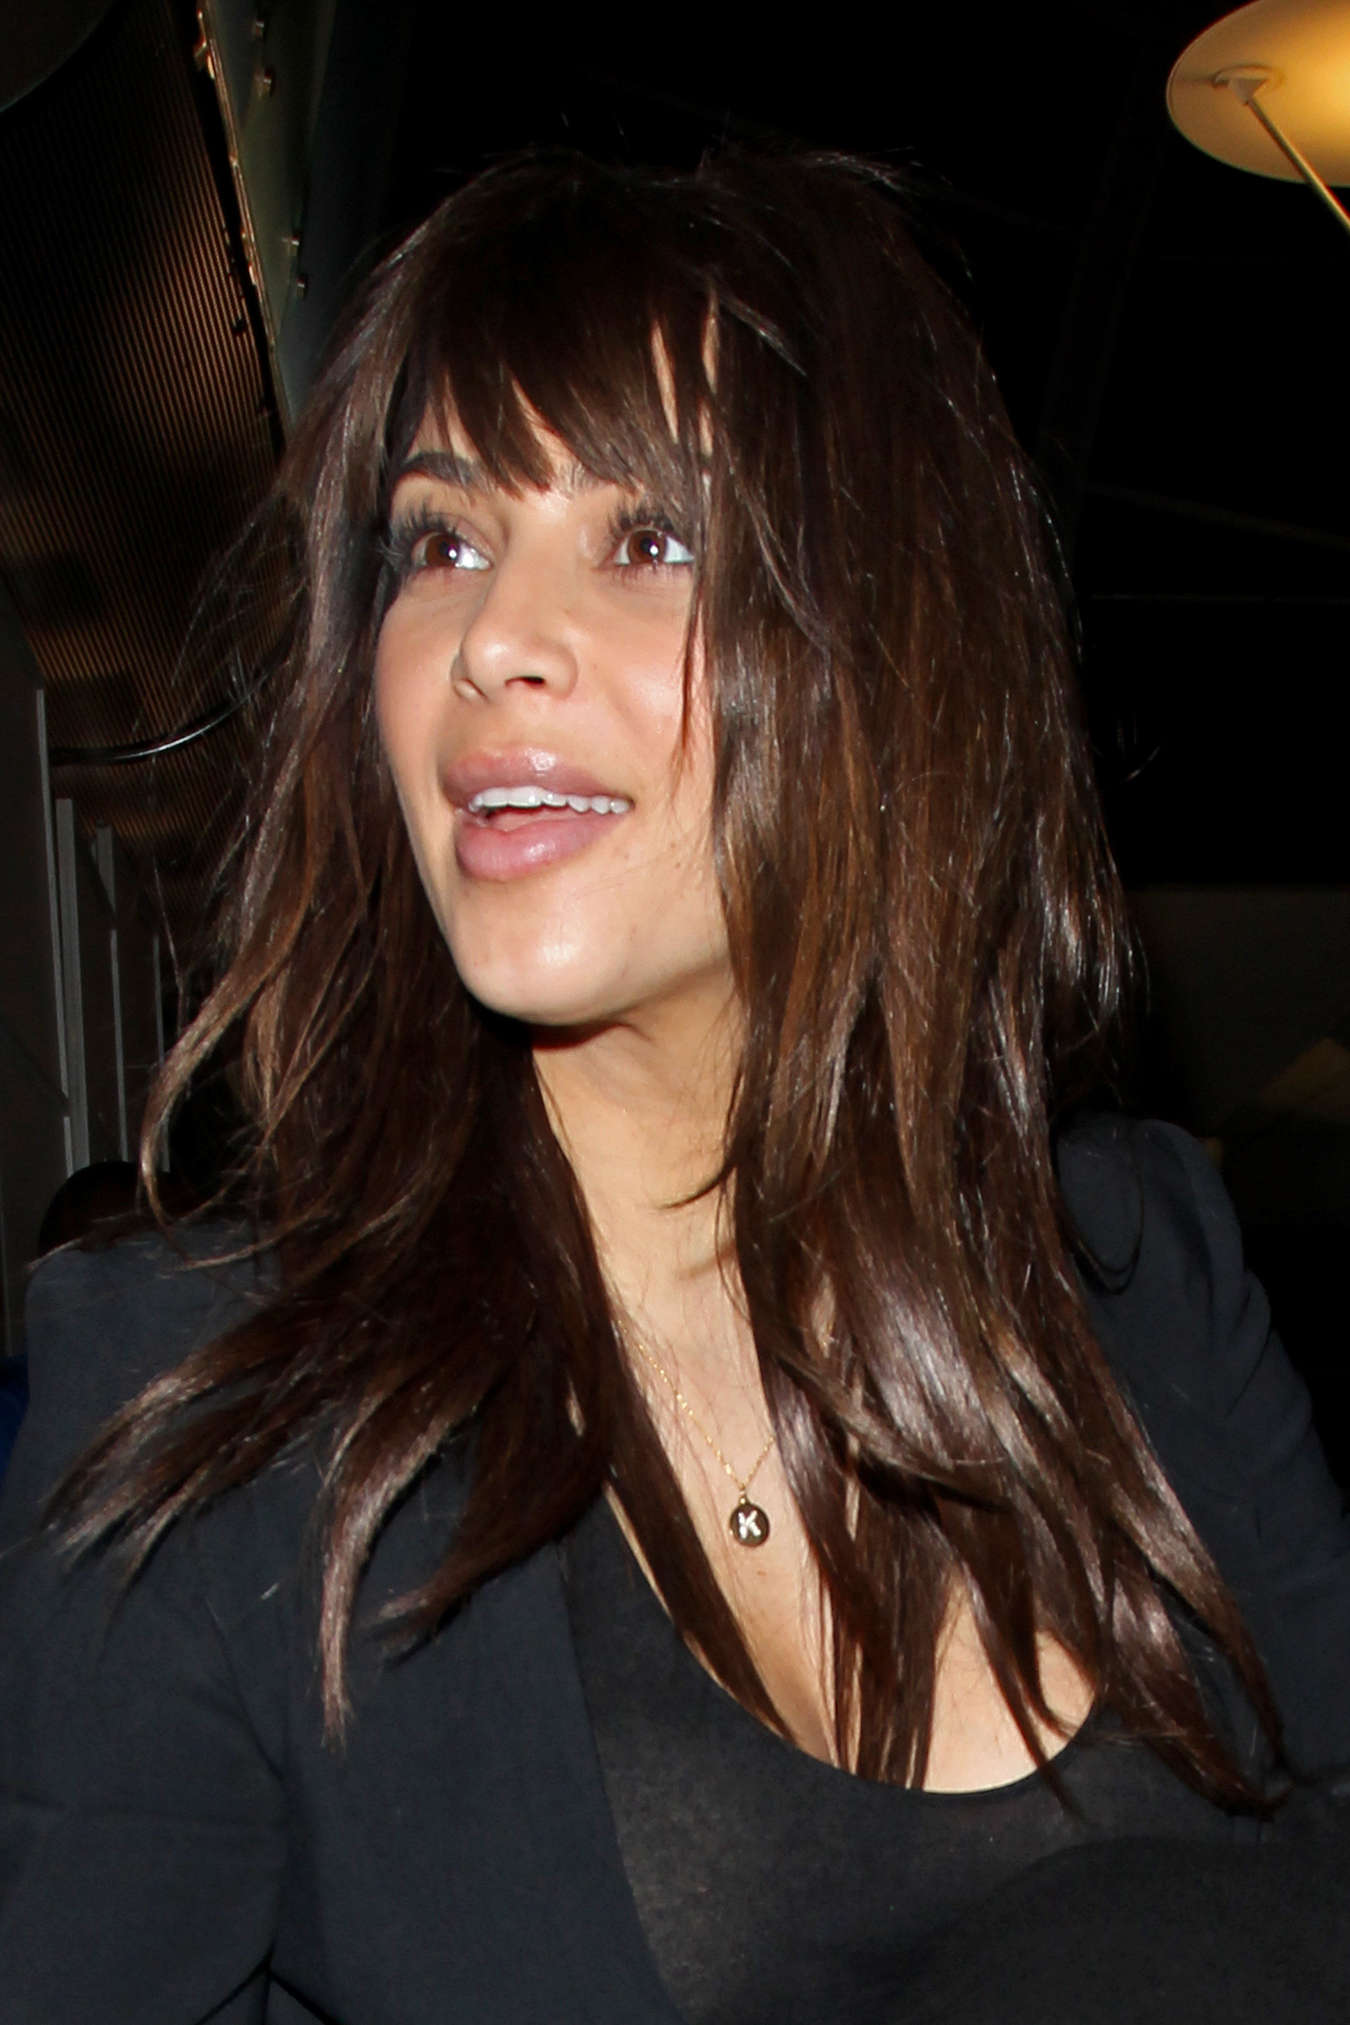 Kim Kardashian Haircut Name Hrotelrehberii